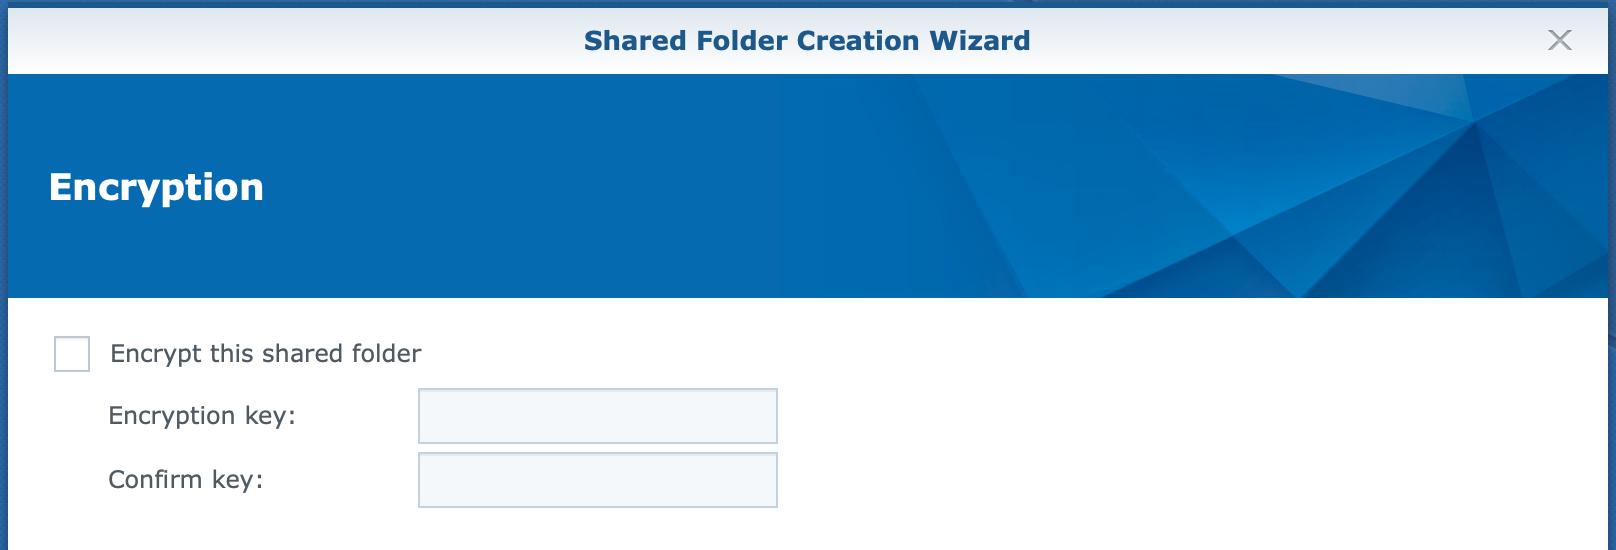 synology, shared folder, create wizard, encryption, dsm6